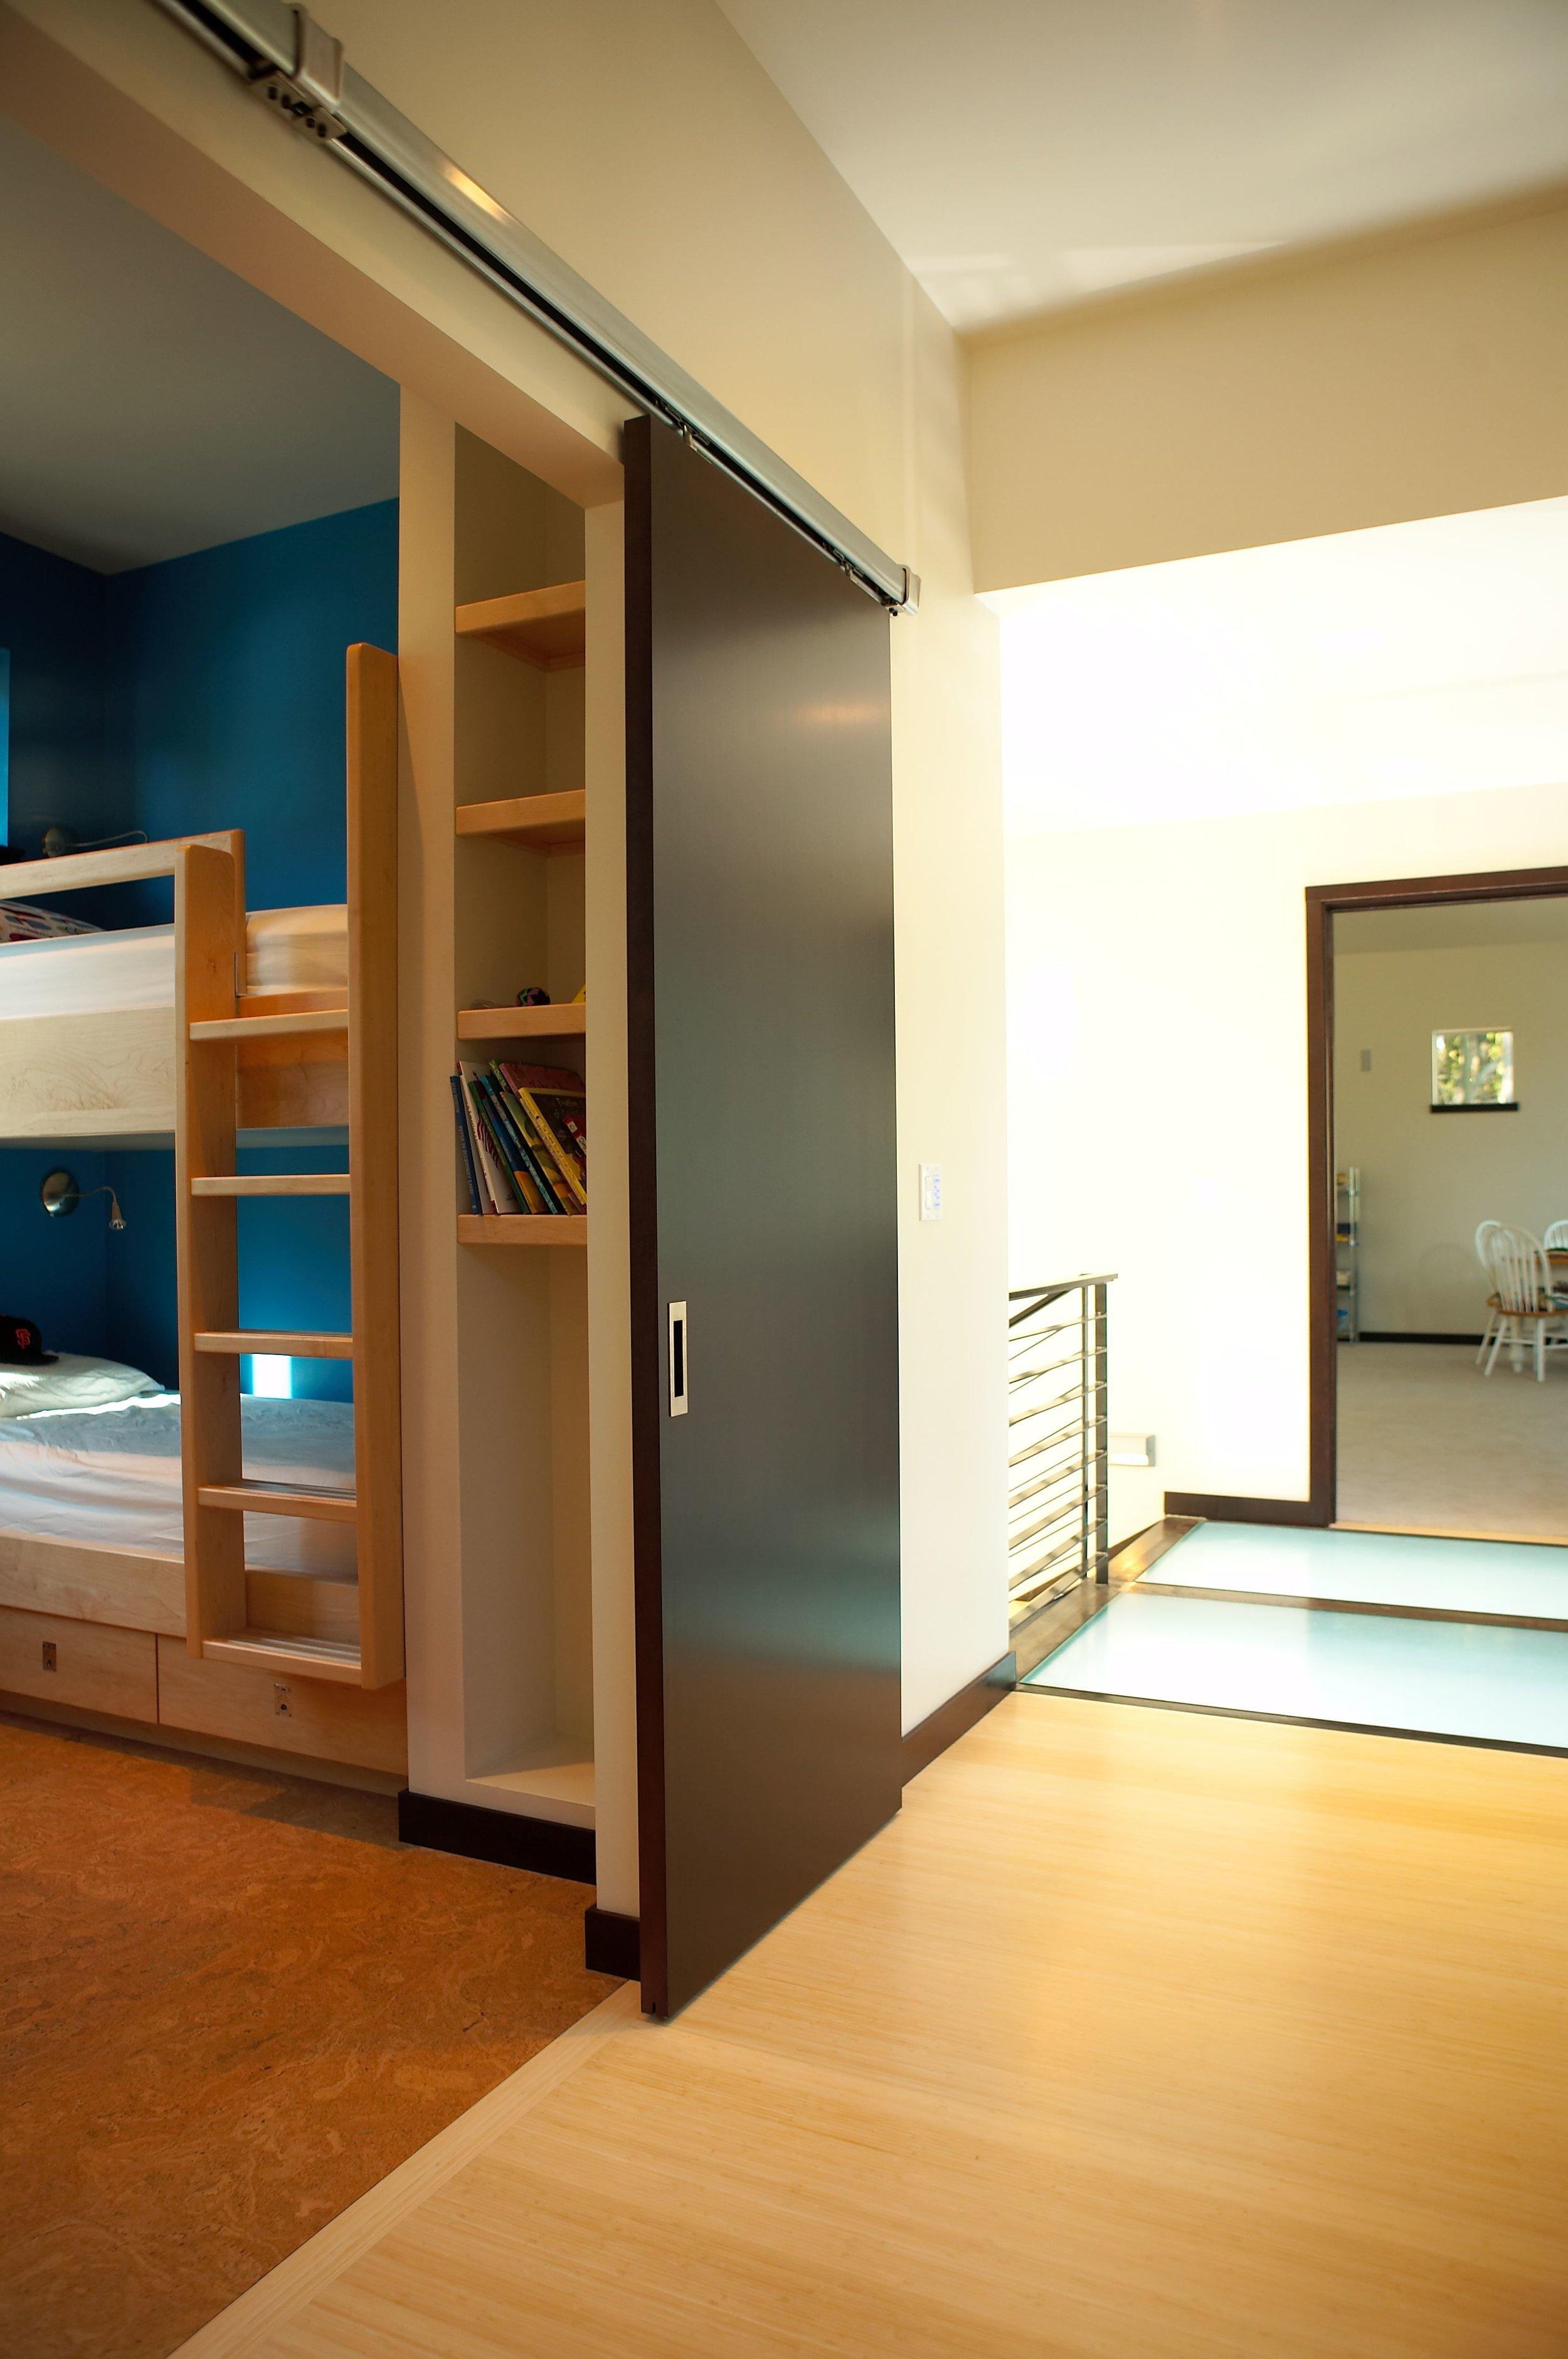 16 Bunk Room.jpg